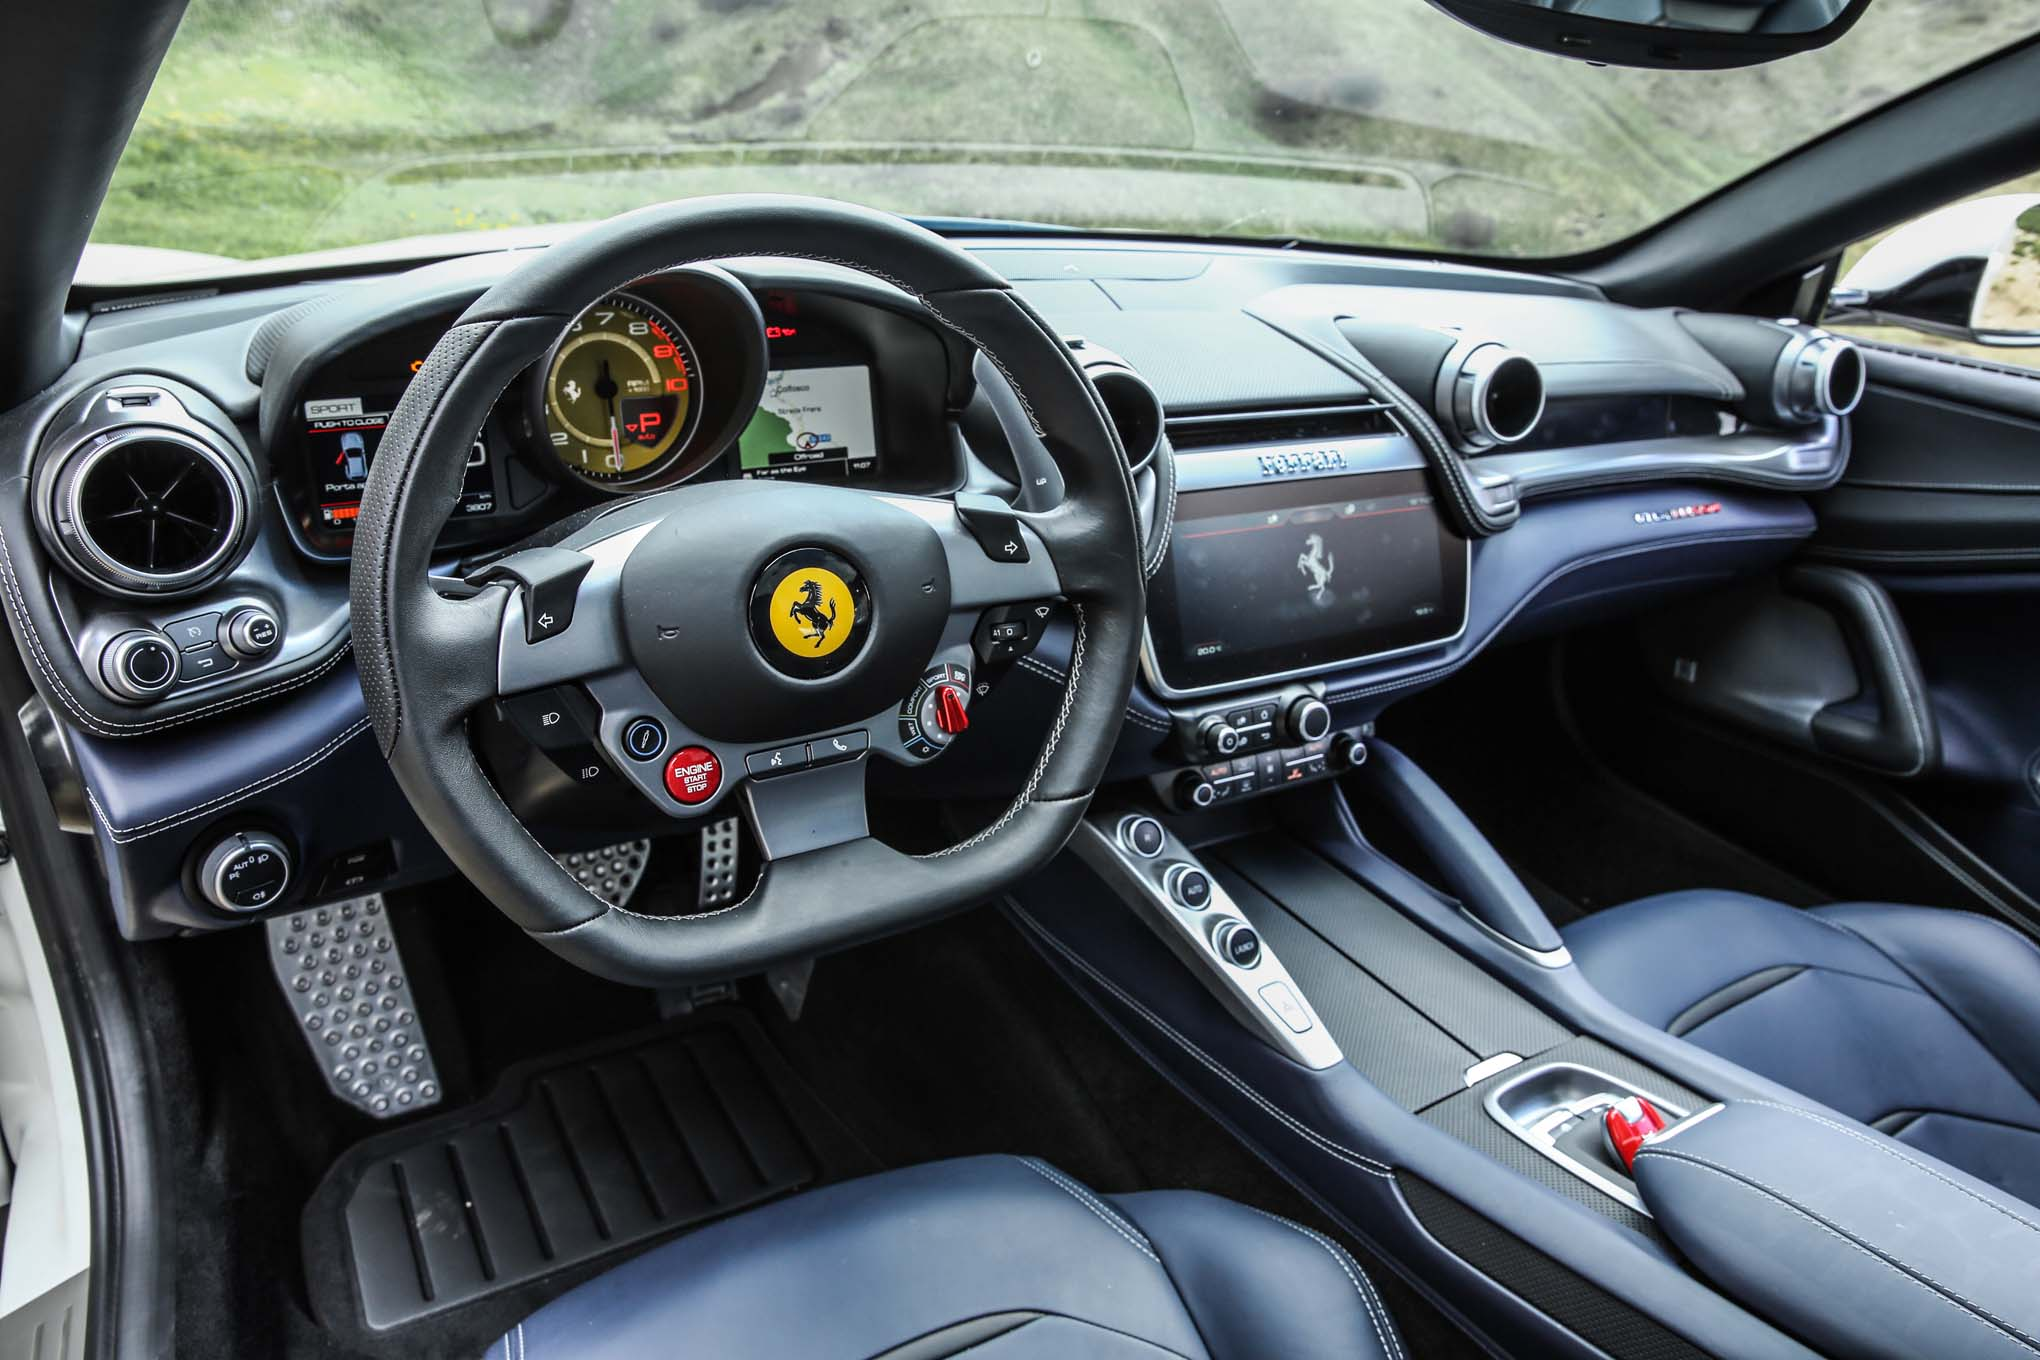 2017-Ferrari-GTC4Lusso-interior-view Remarkable Ferrari Mondial Rear Window Motor Cars Trend